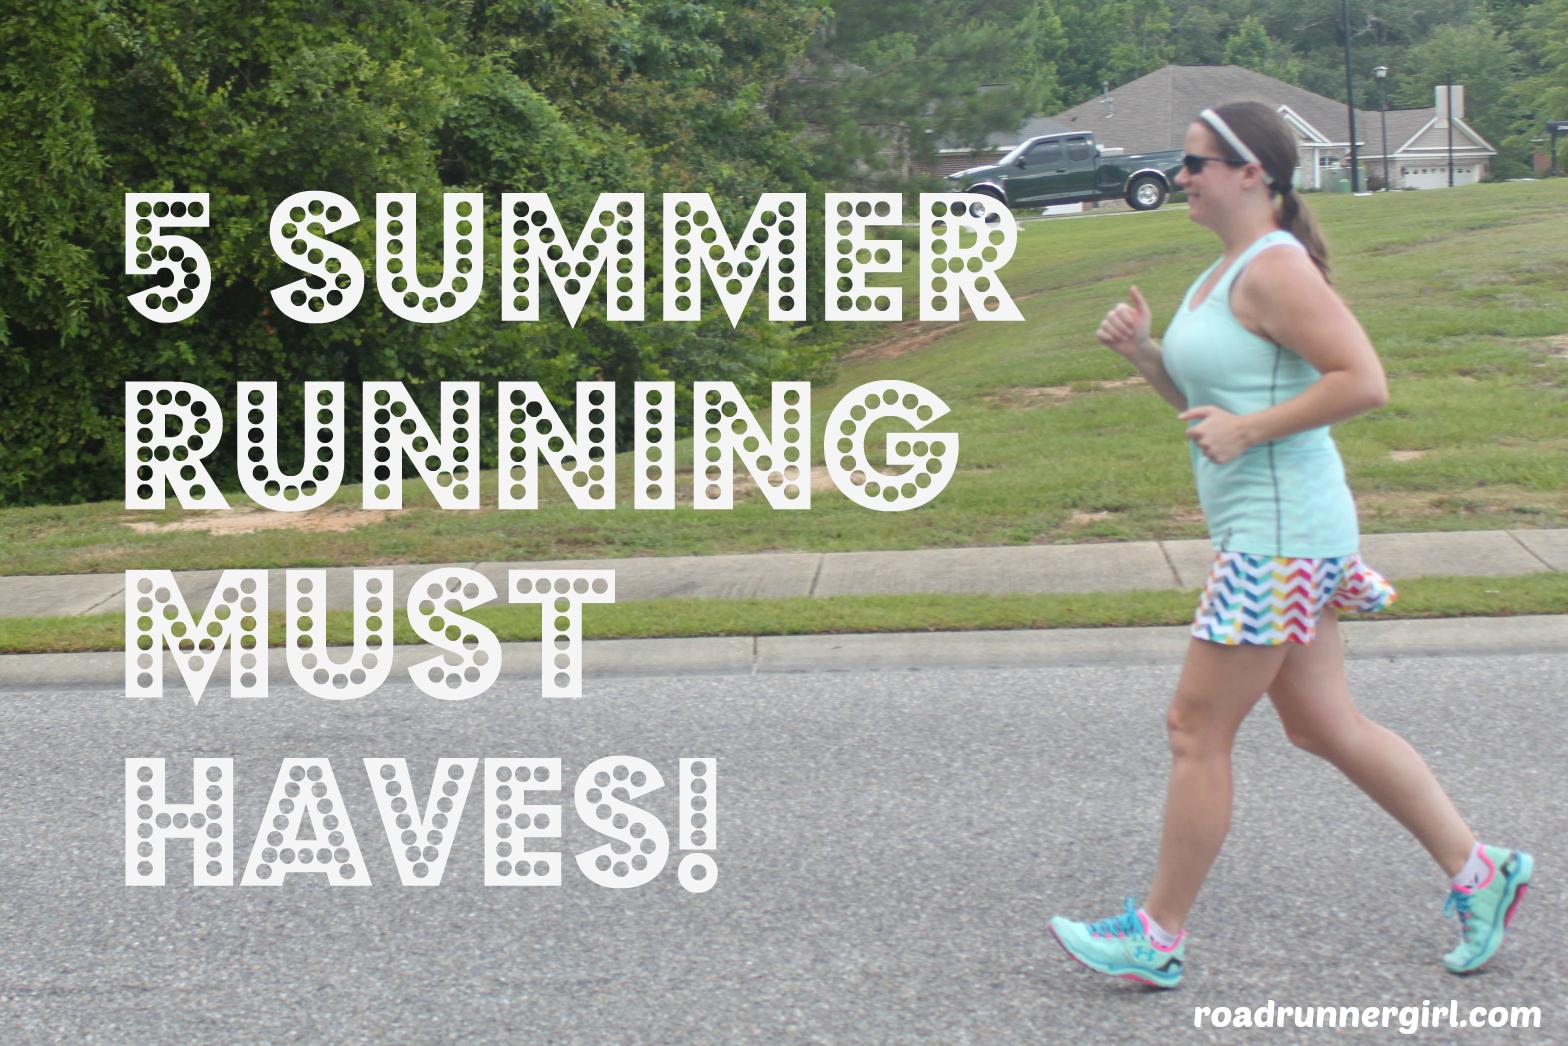 road runner girl 5 summer running must haves. Black Bedroom Furniture Sets. Home Design Ideas